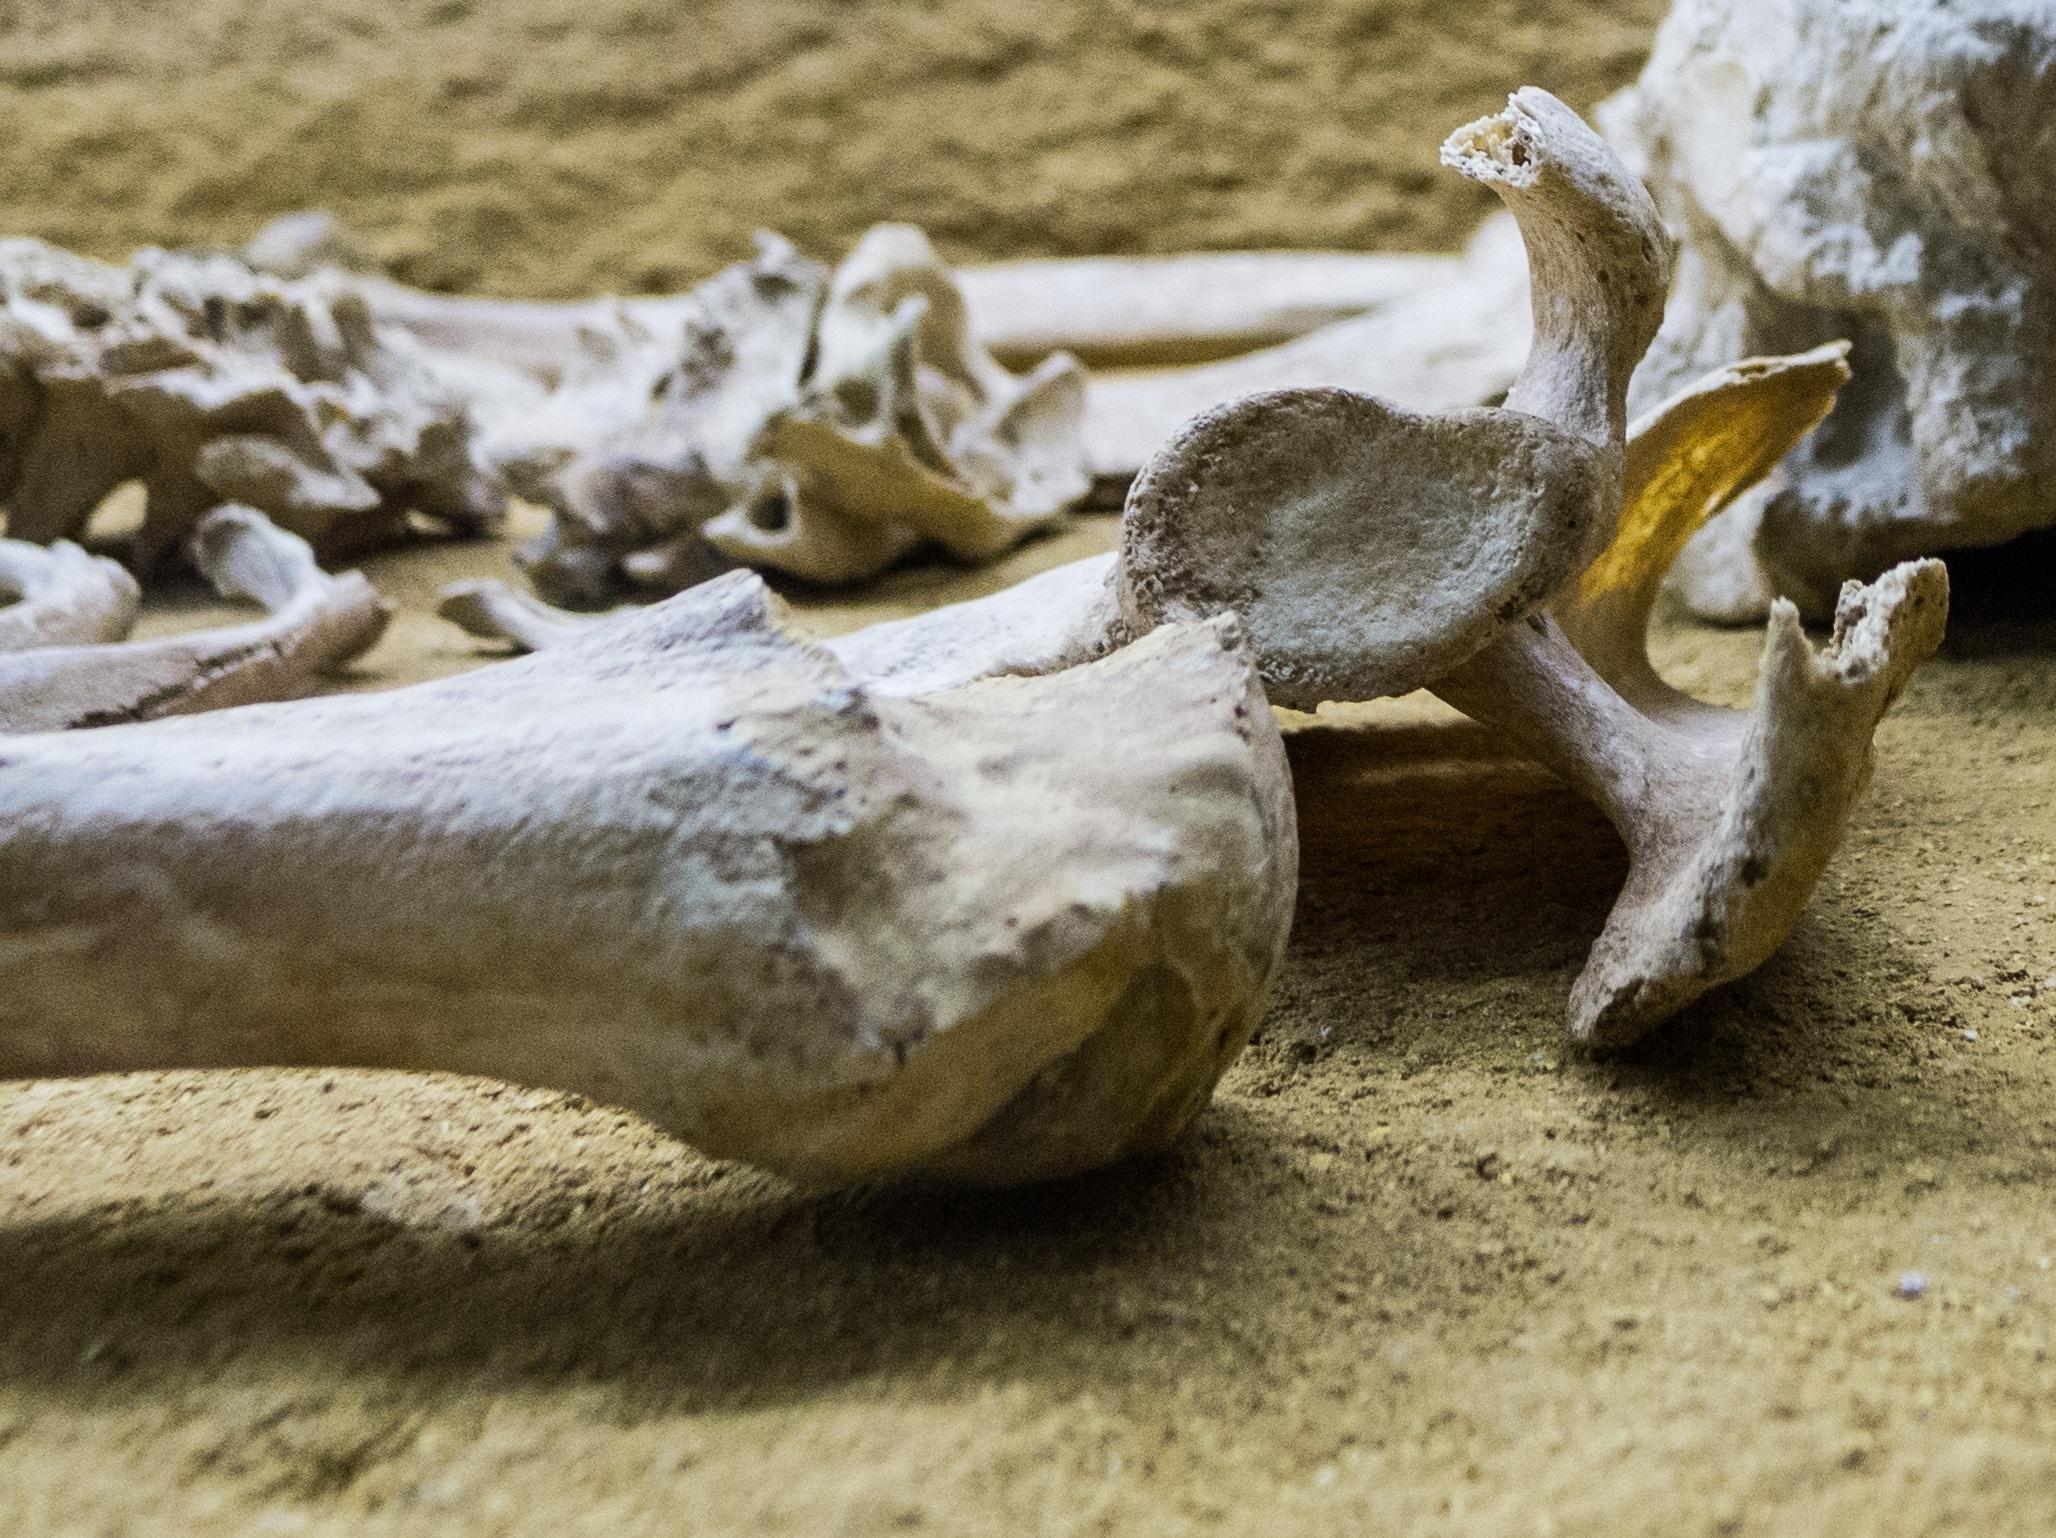 Fotos gratis : Driftwood, arena, madera, cuerno, museo, muerto ...